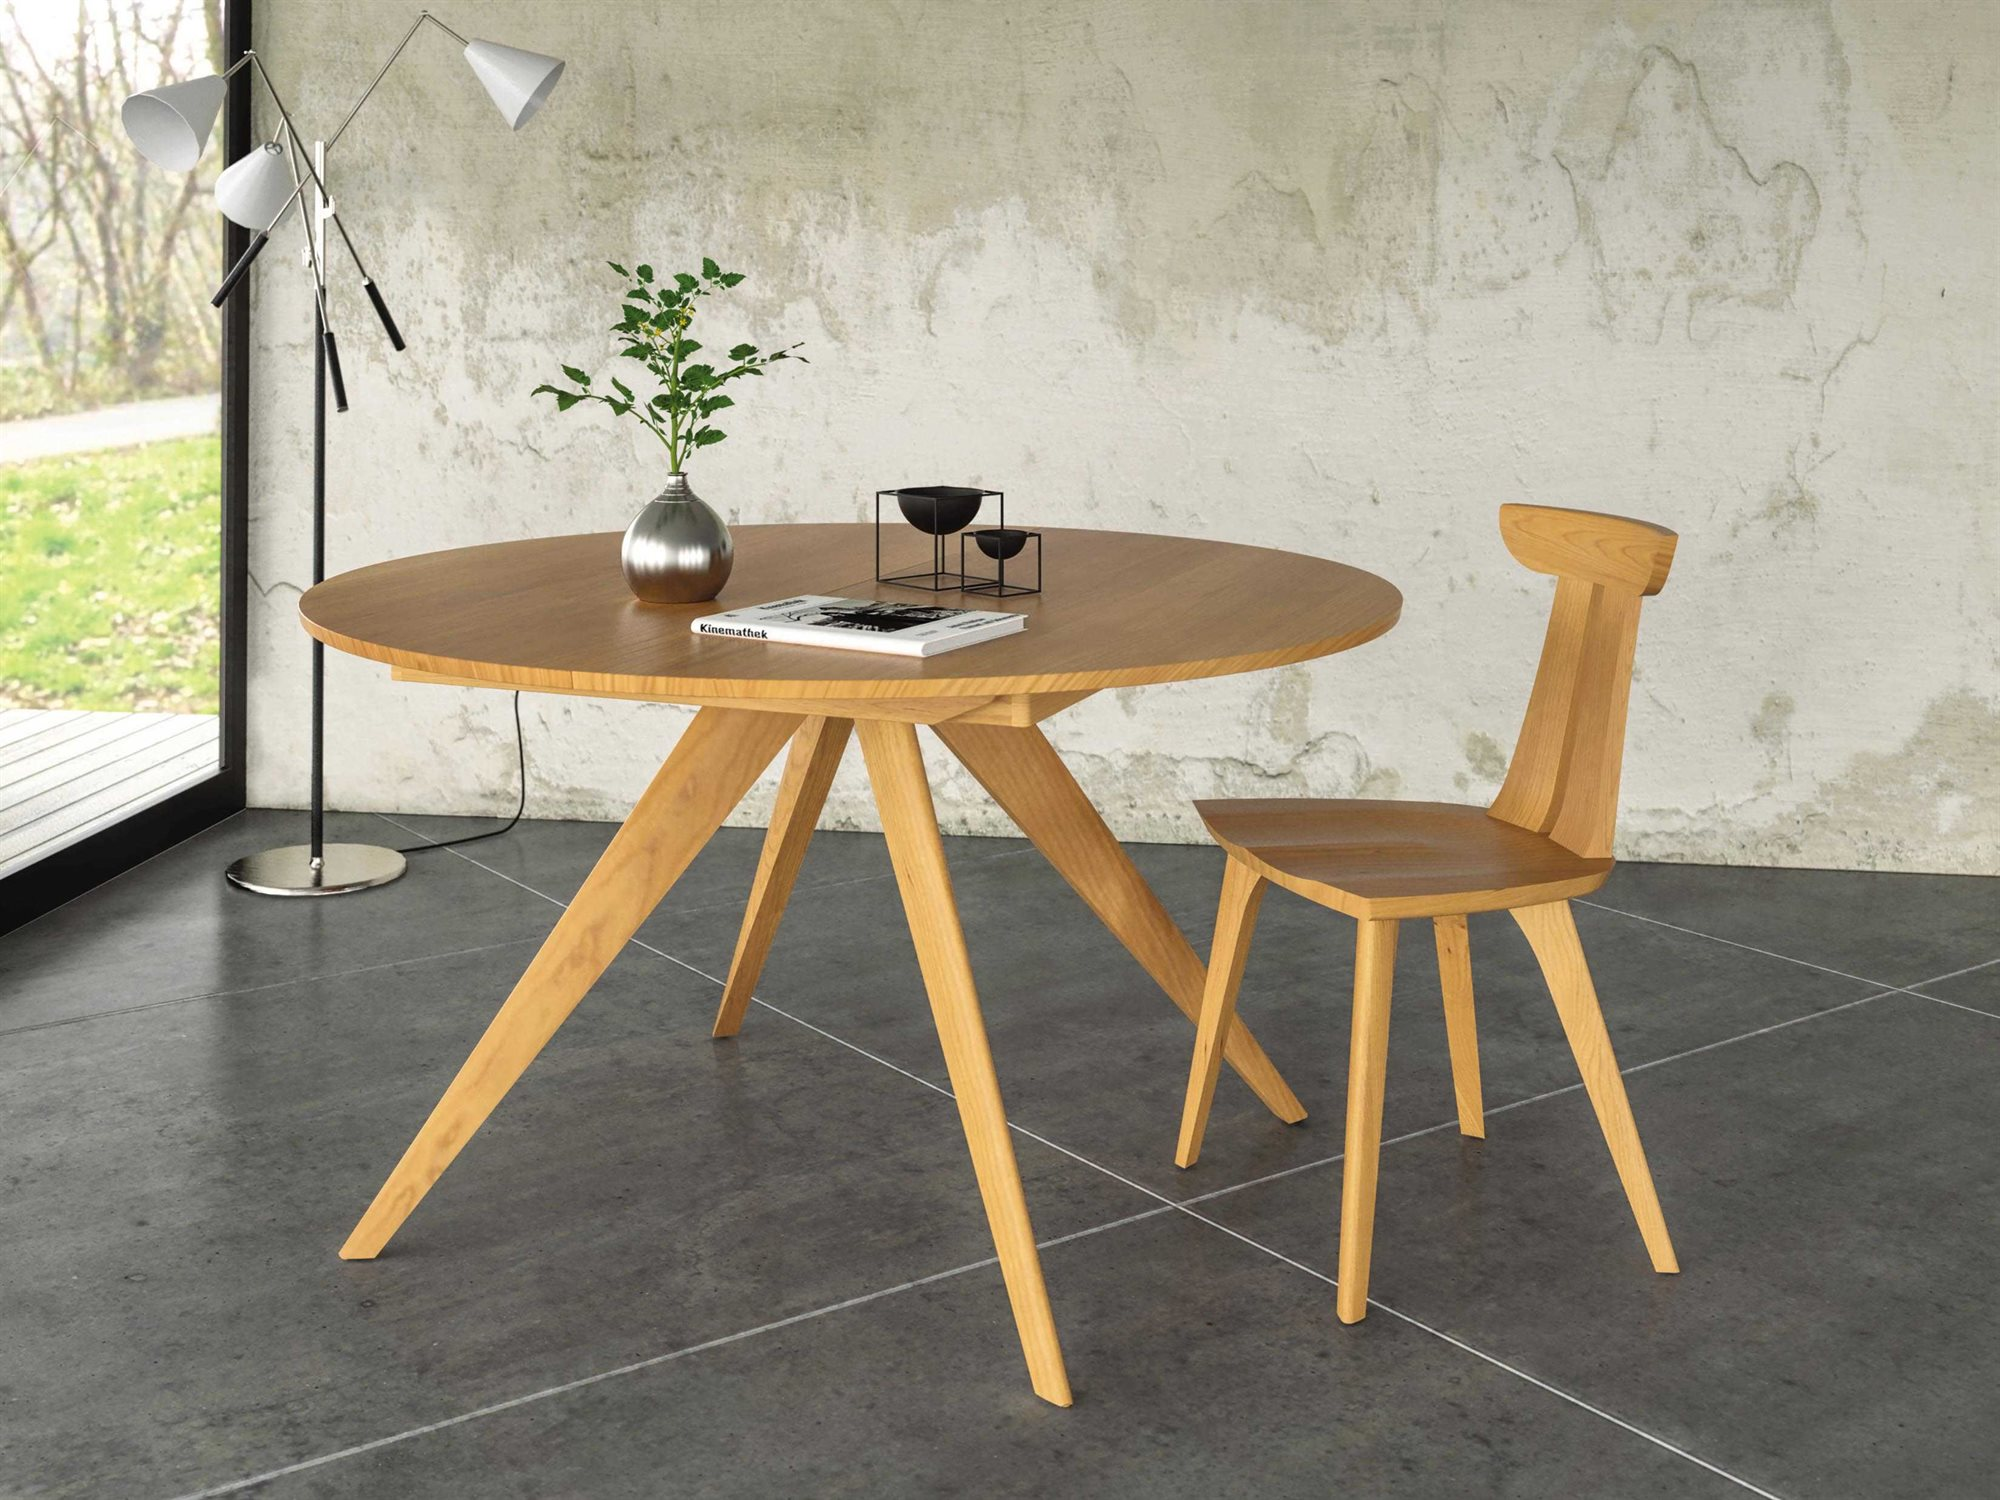 Copeland Furniture Catalina Dining Room Set